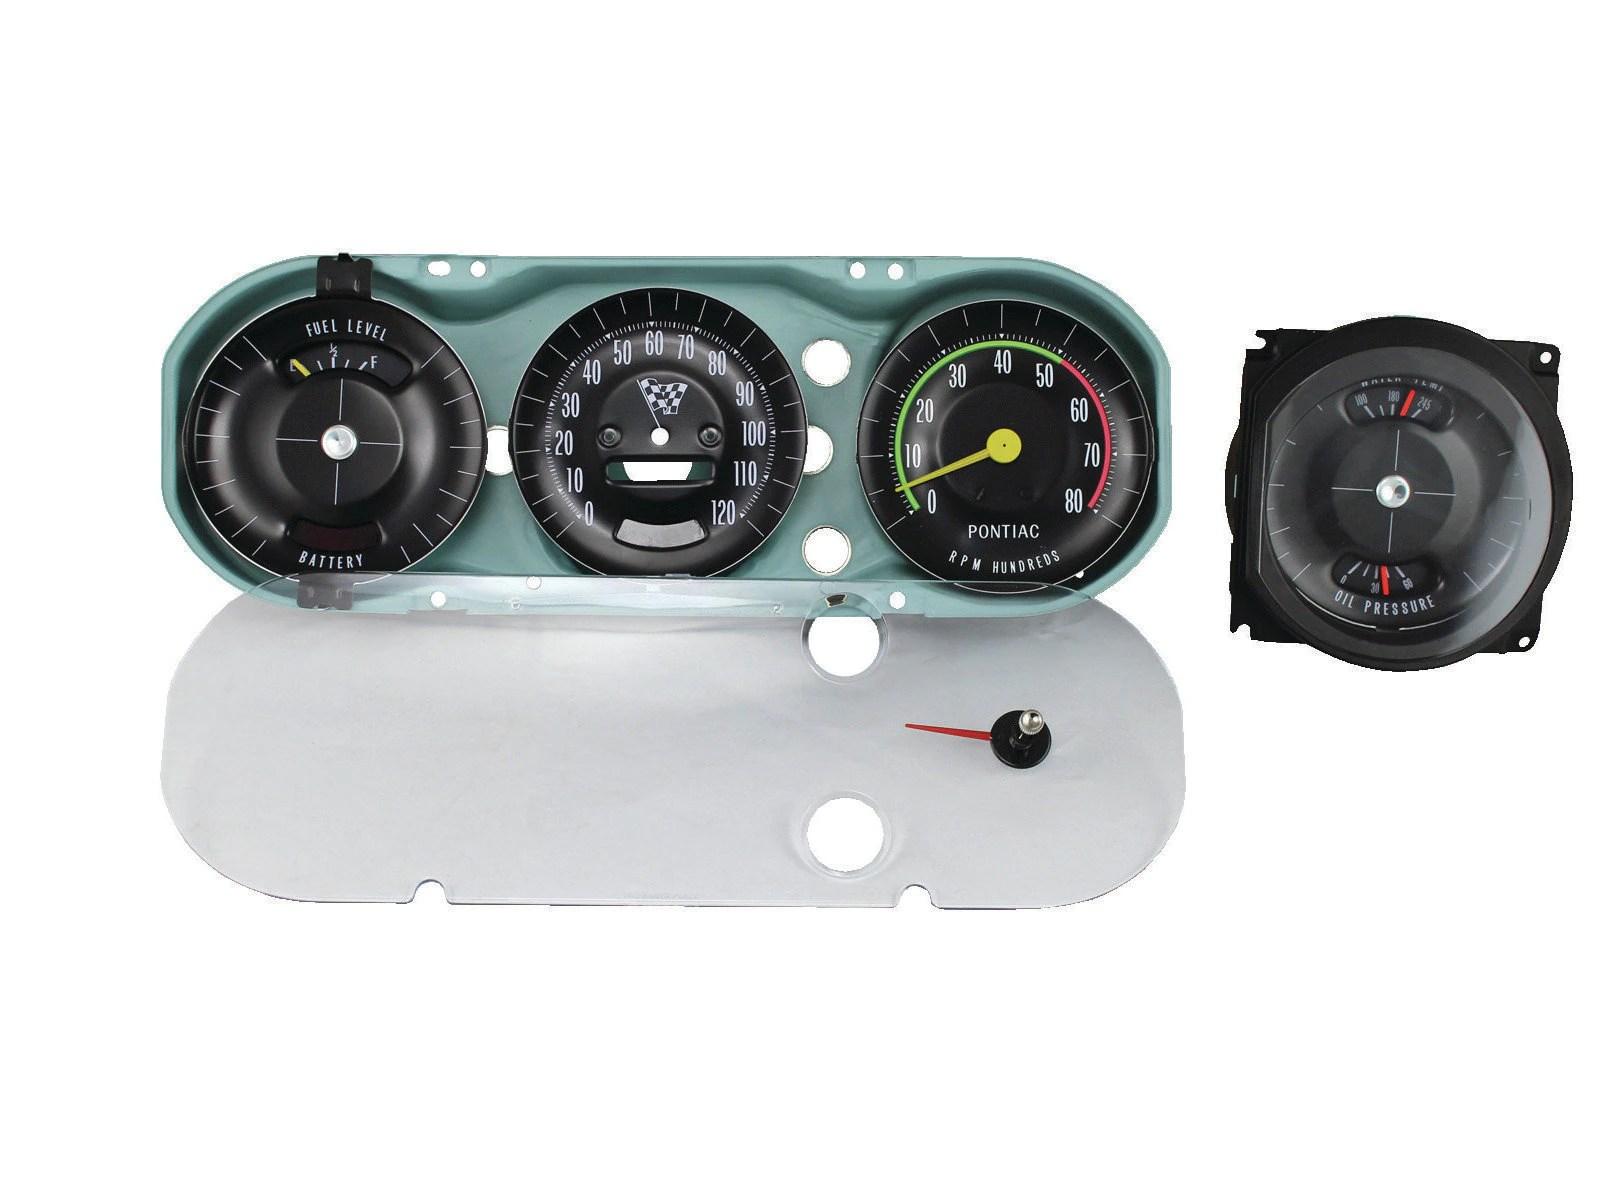 1967 gto rally gauge wiring diagram wiring 1964 pontiac gto wiring diagram 67 gto rally [ 1600 x 1200 Pixel ]